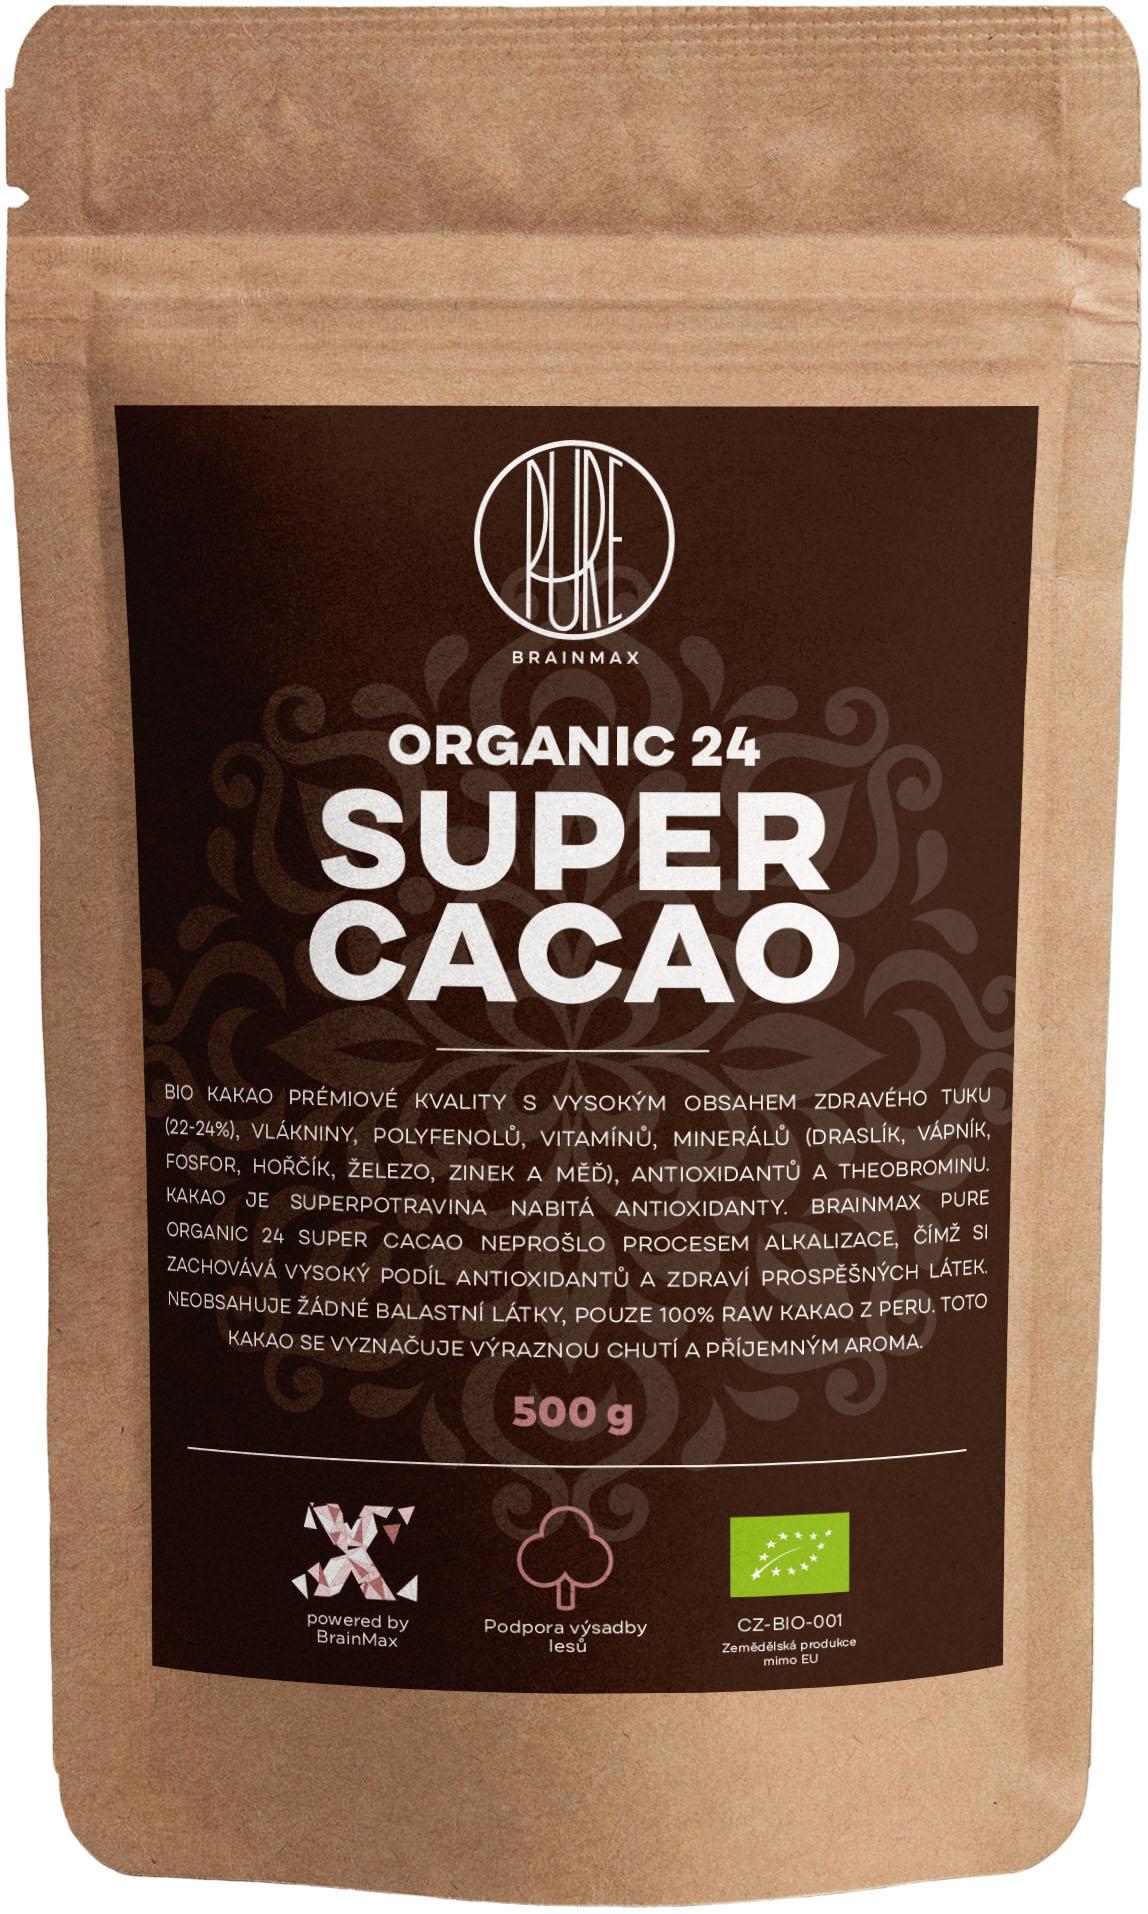 BrainMax Pure Organic 24 Super Cacao, BIO kakao, 500g *CZ-BIO-001 certifikát